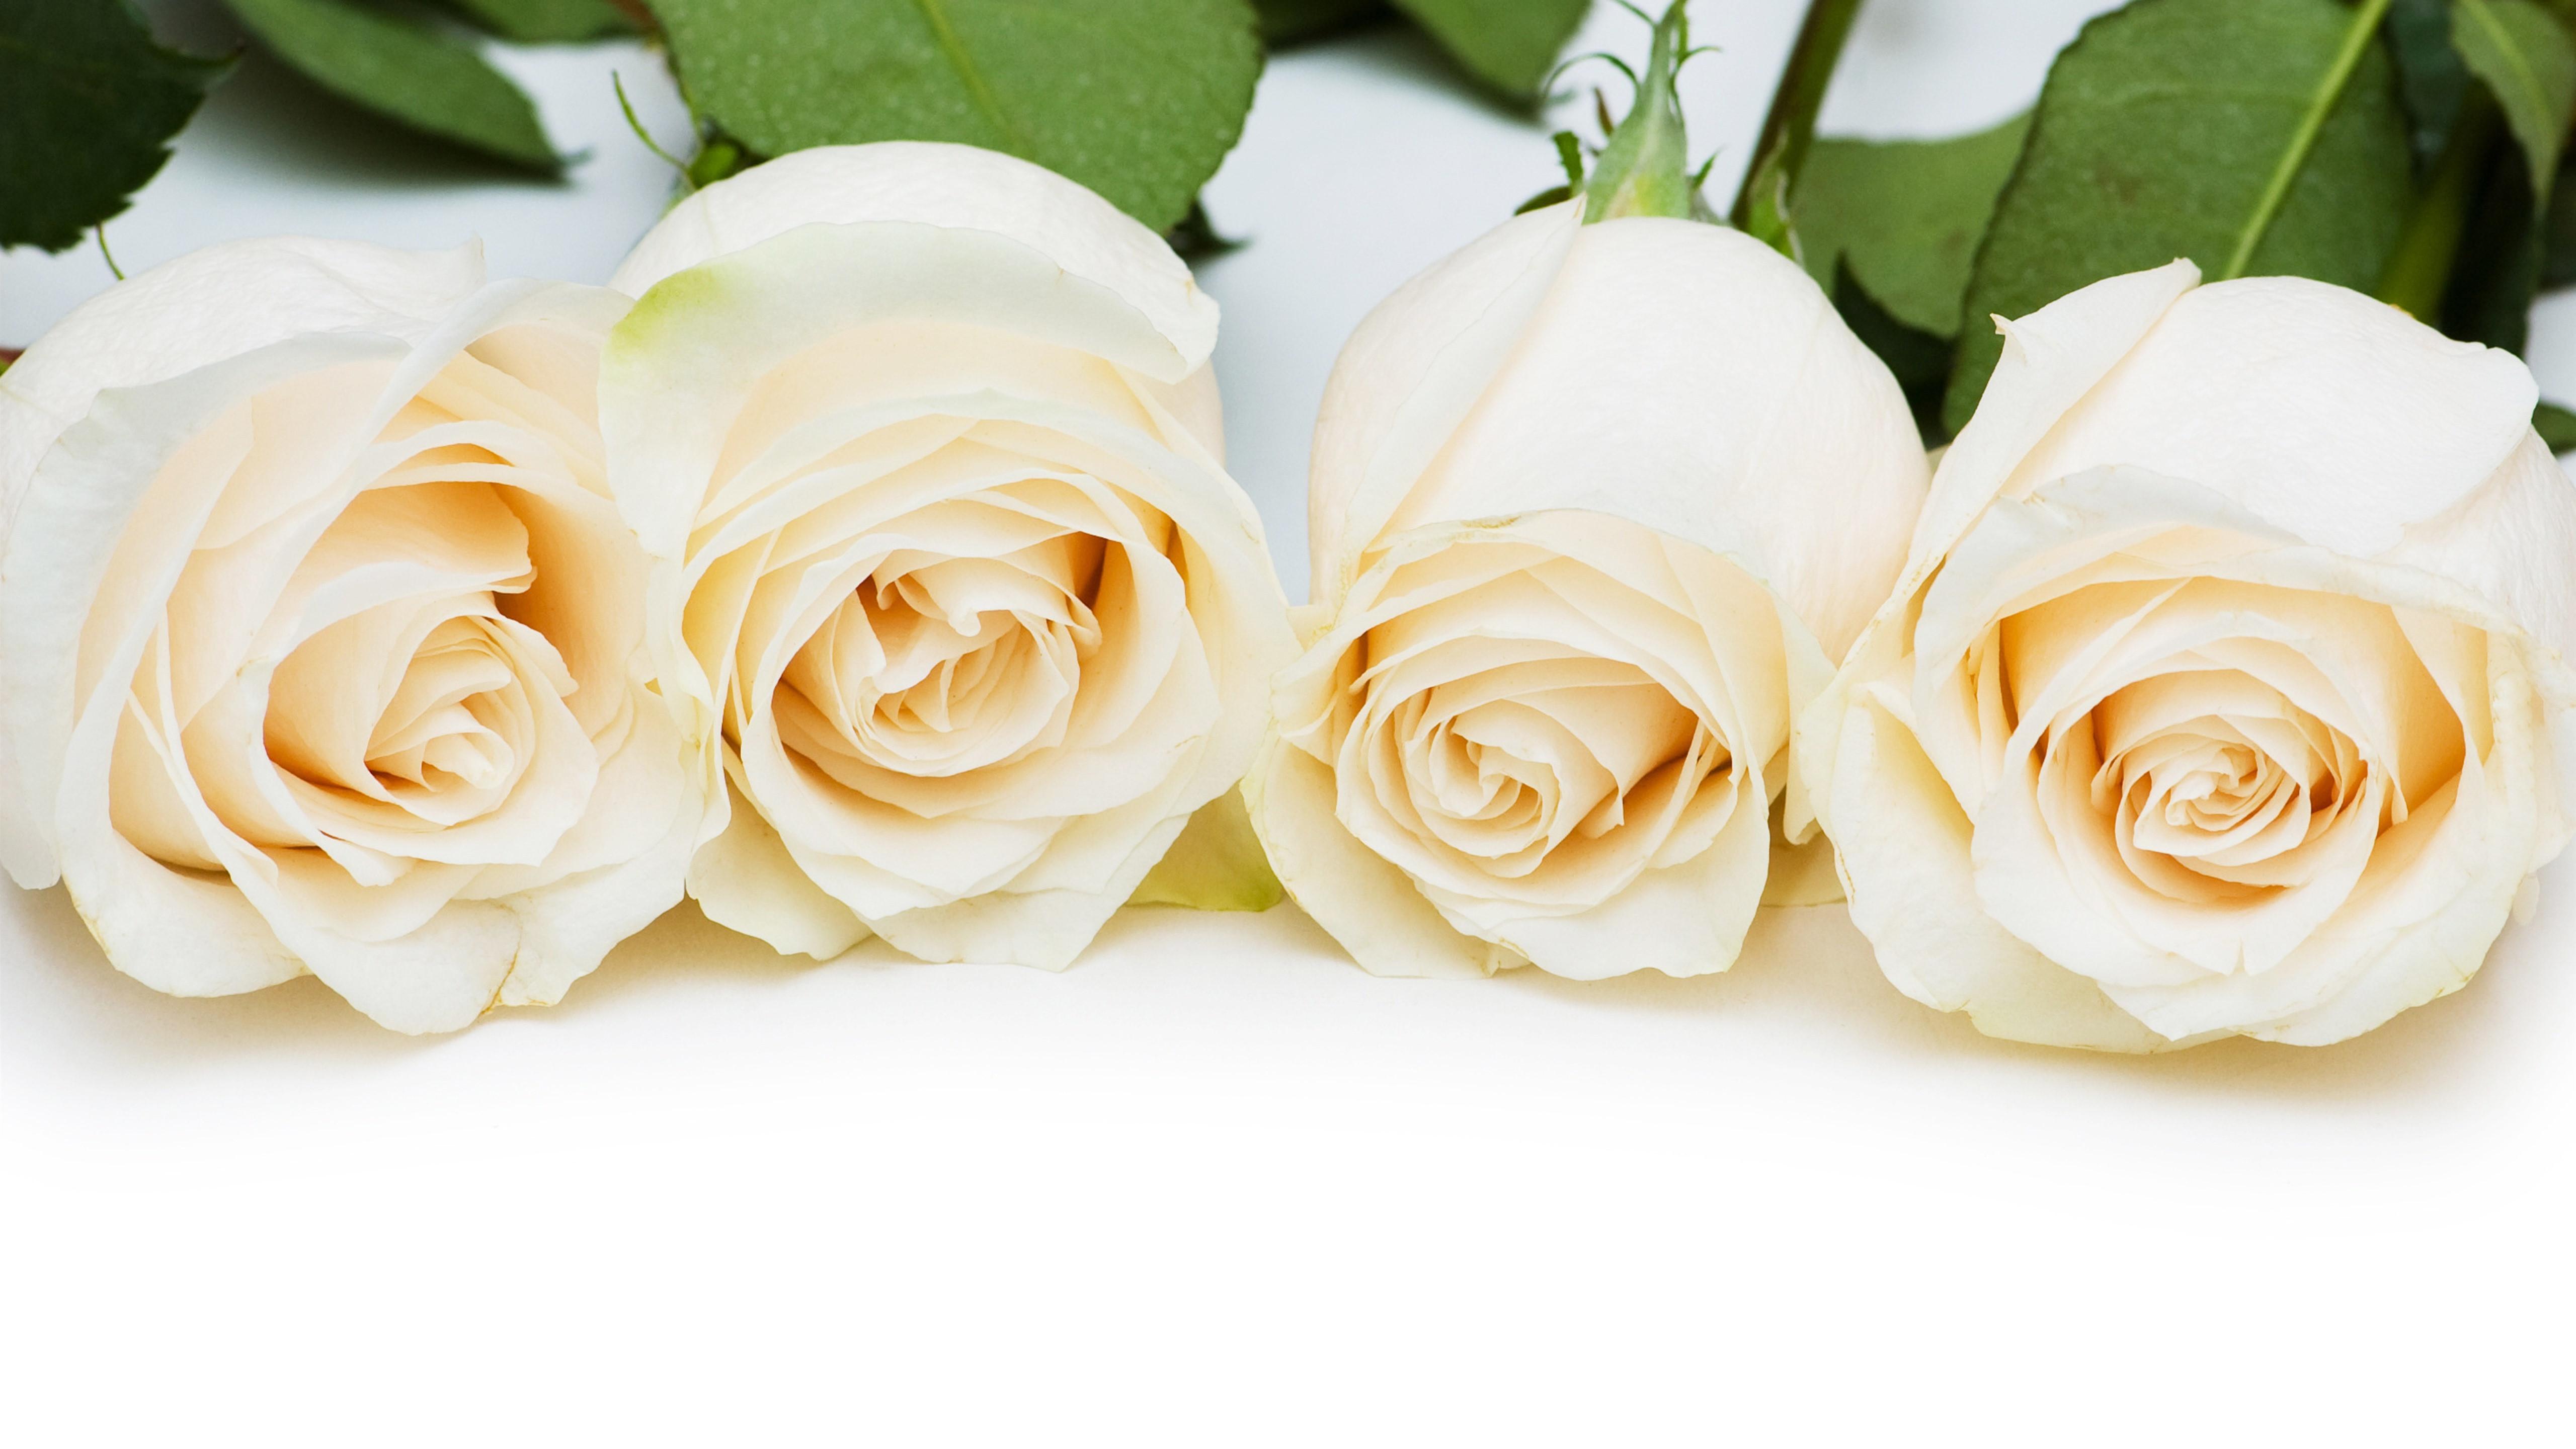 White Rose Wallpaper Best Wallpaper - Beautiful White Rose Flowers , HD Wallpaper & Backgrounds